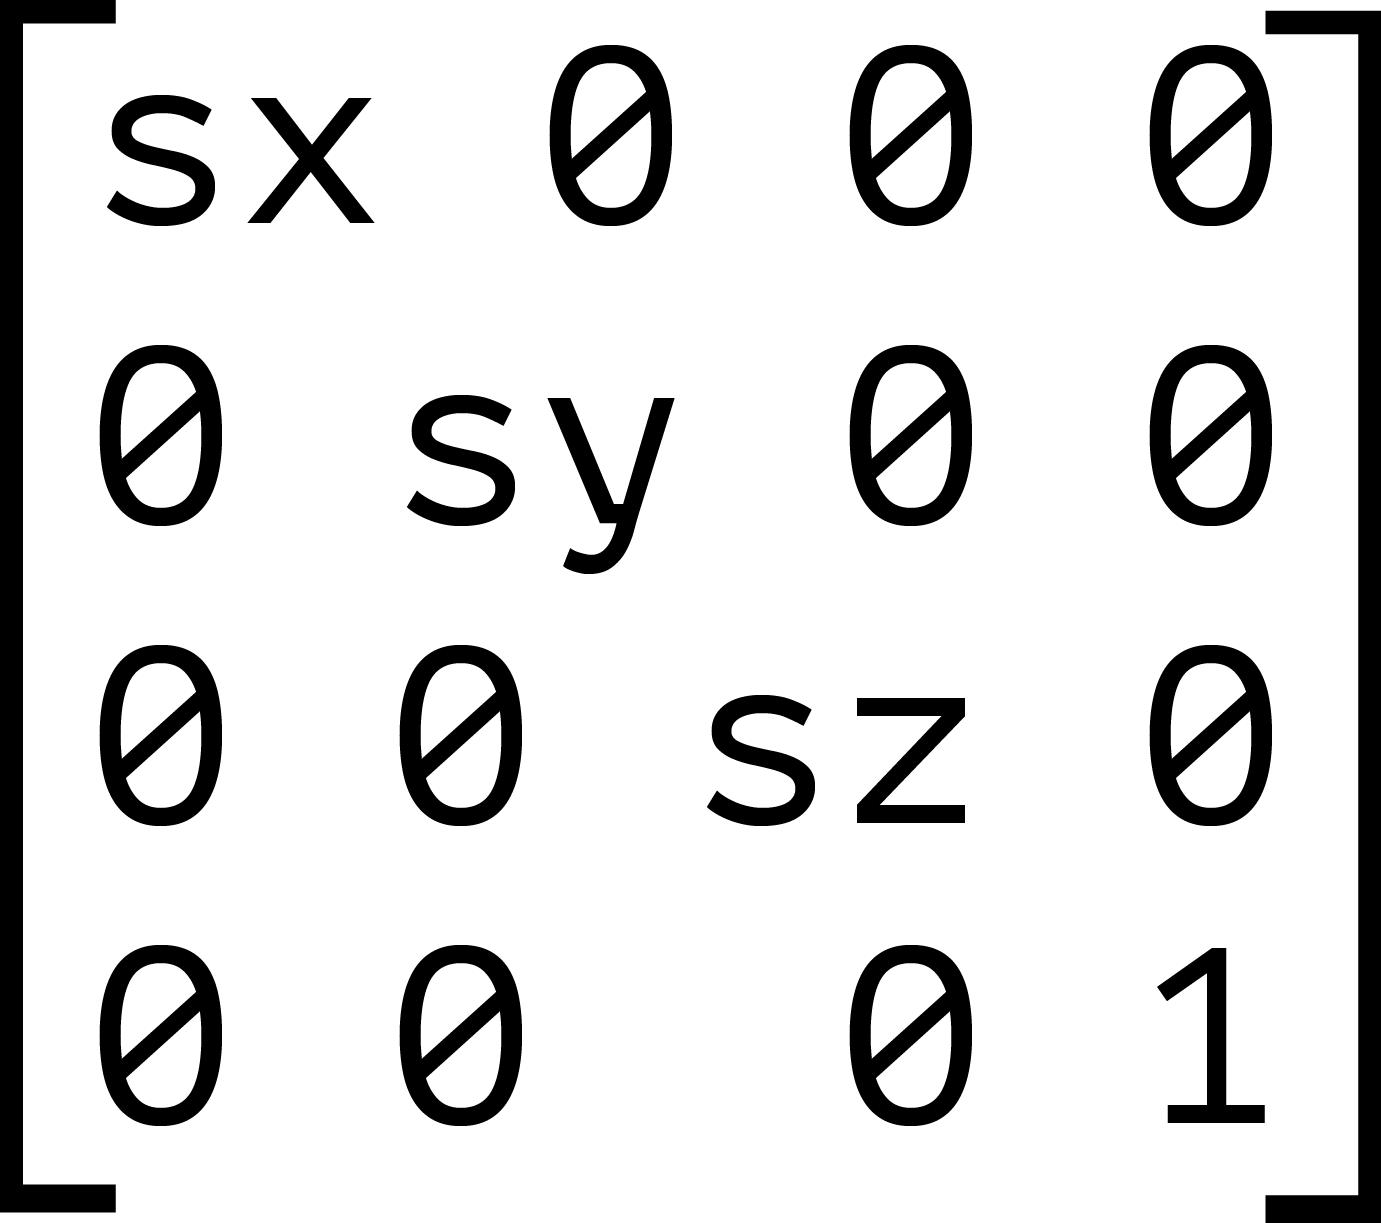 The 4×4 scaling transform matrix